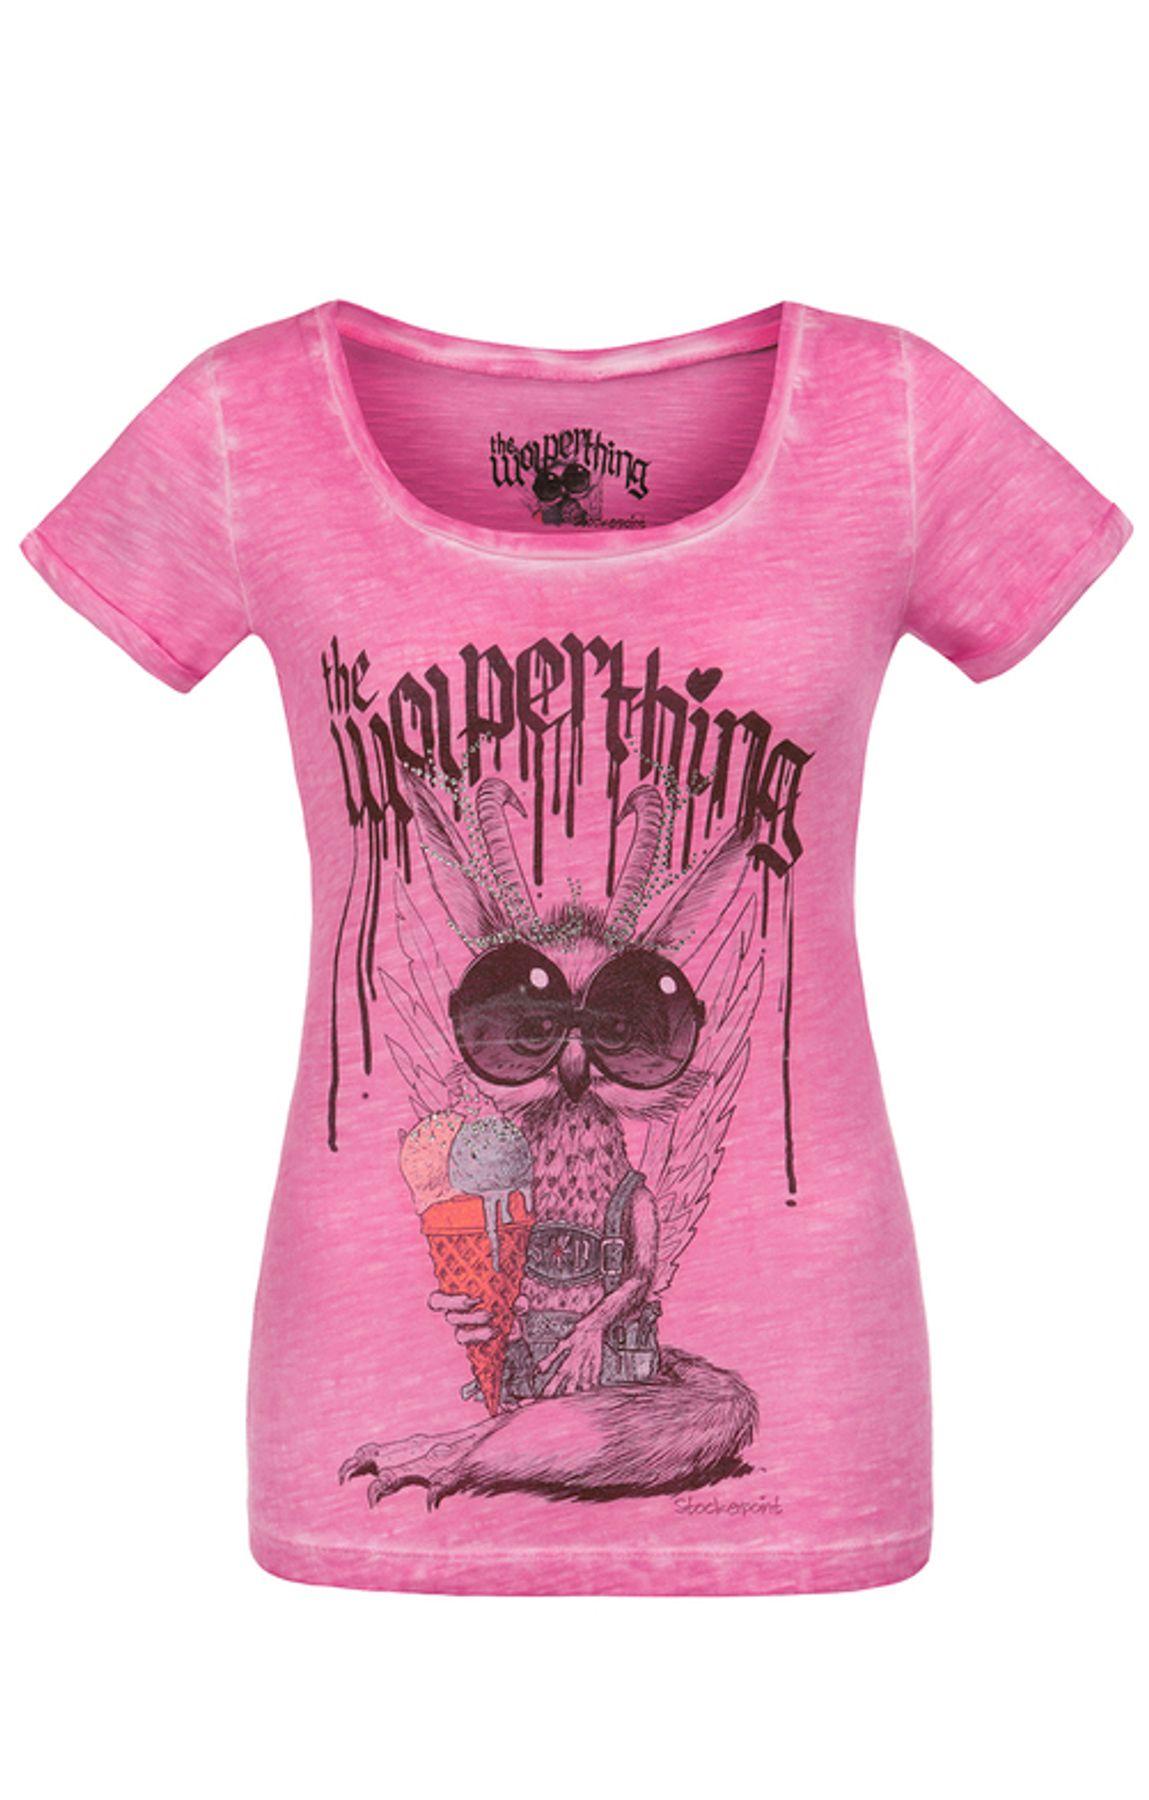 Stockerpoint - Kinder Trachten T-Shirt Wolpigirl, Gr. 86-140 – Bild 5